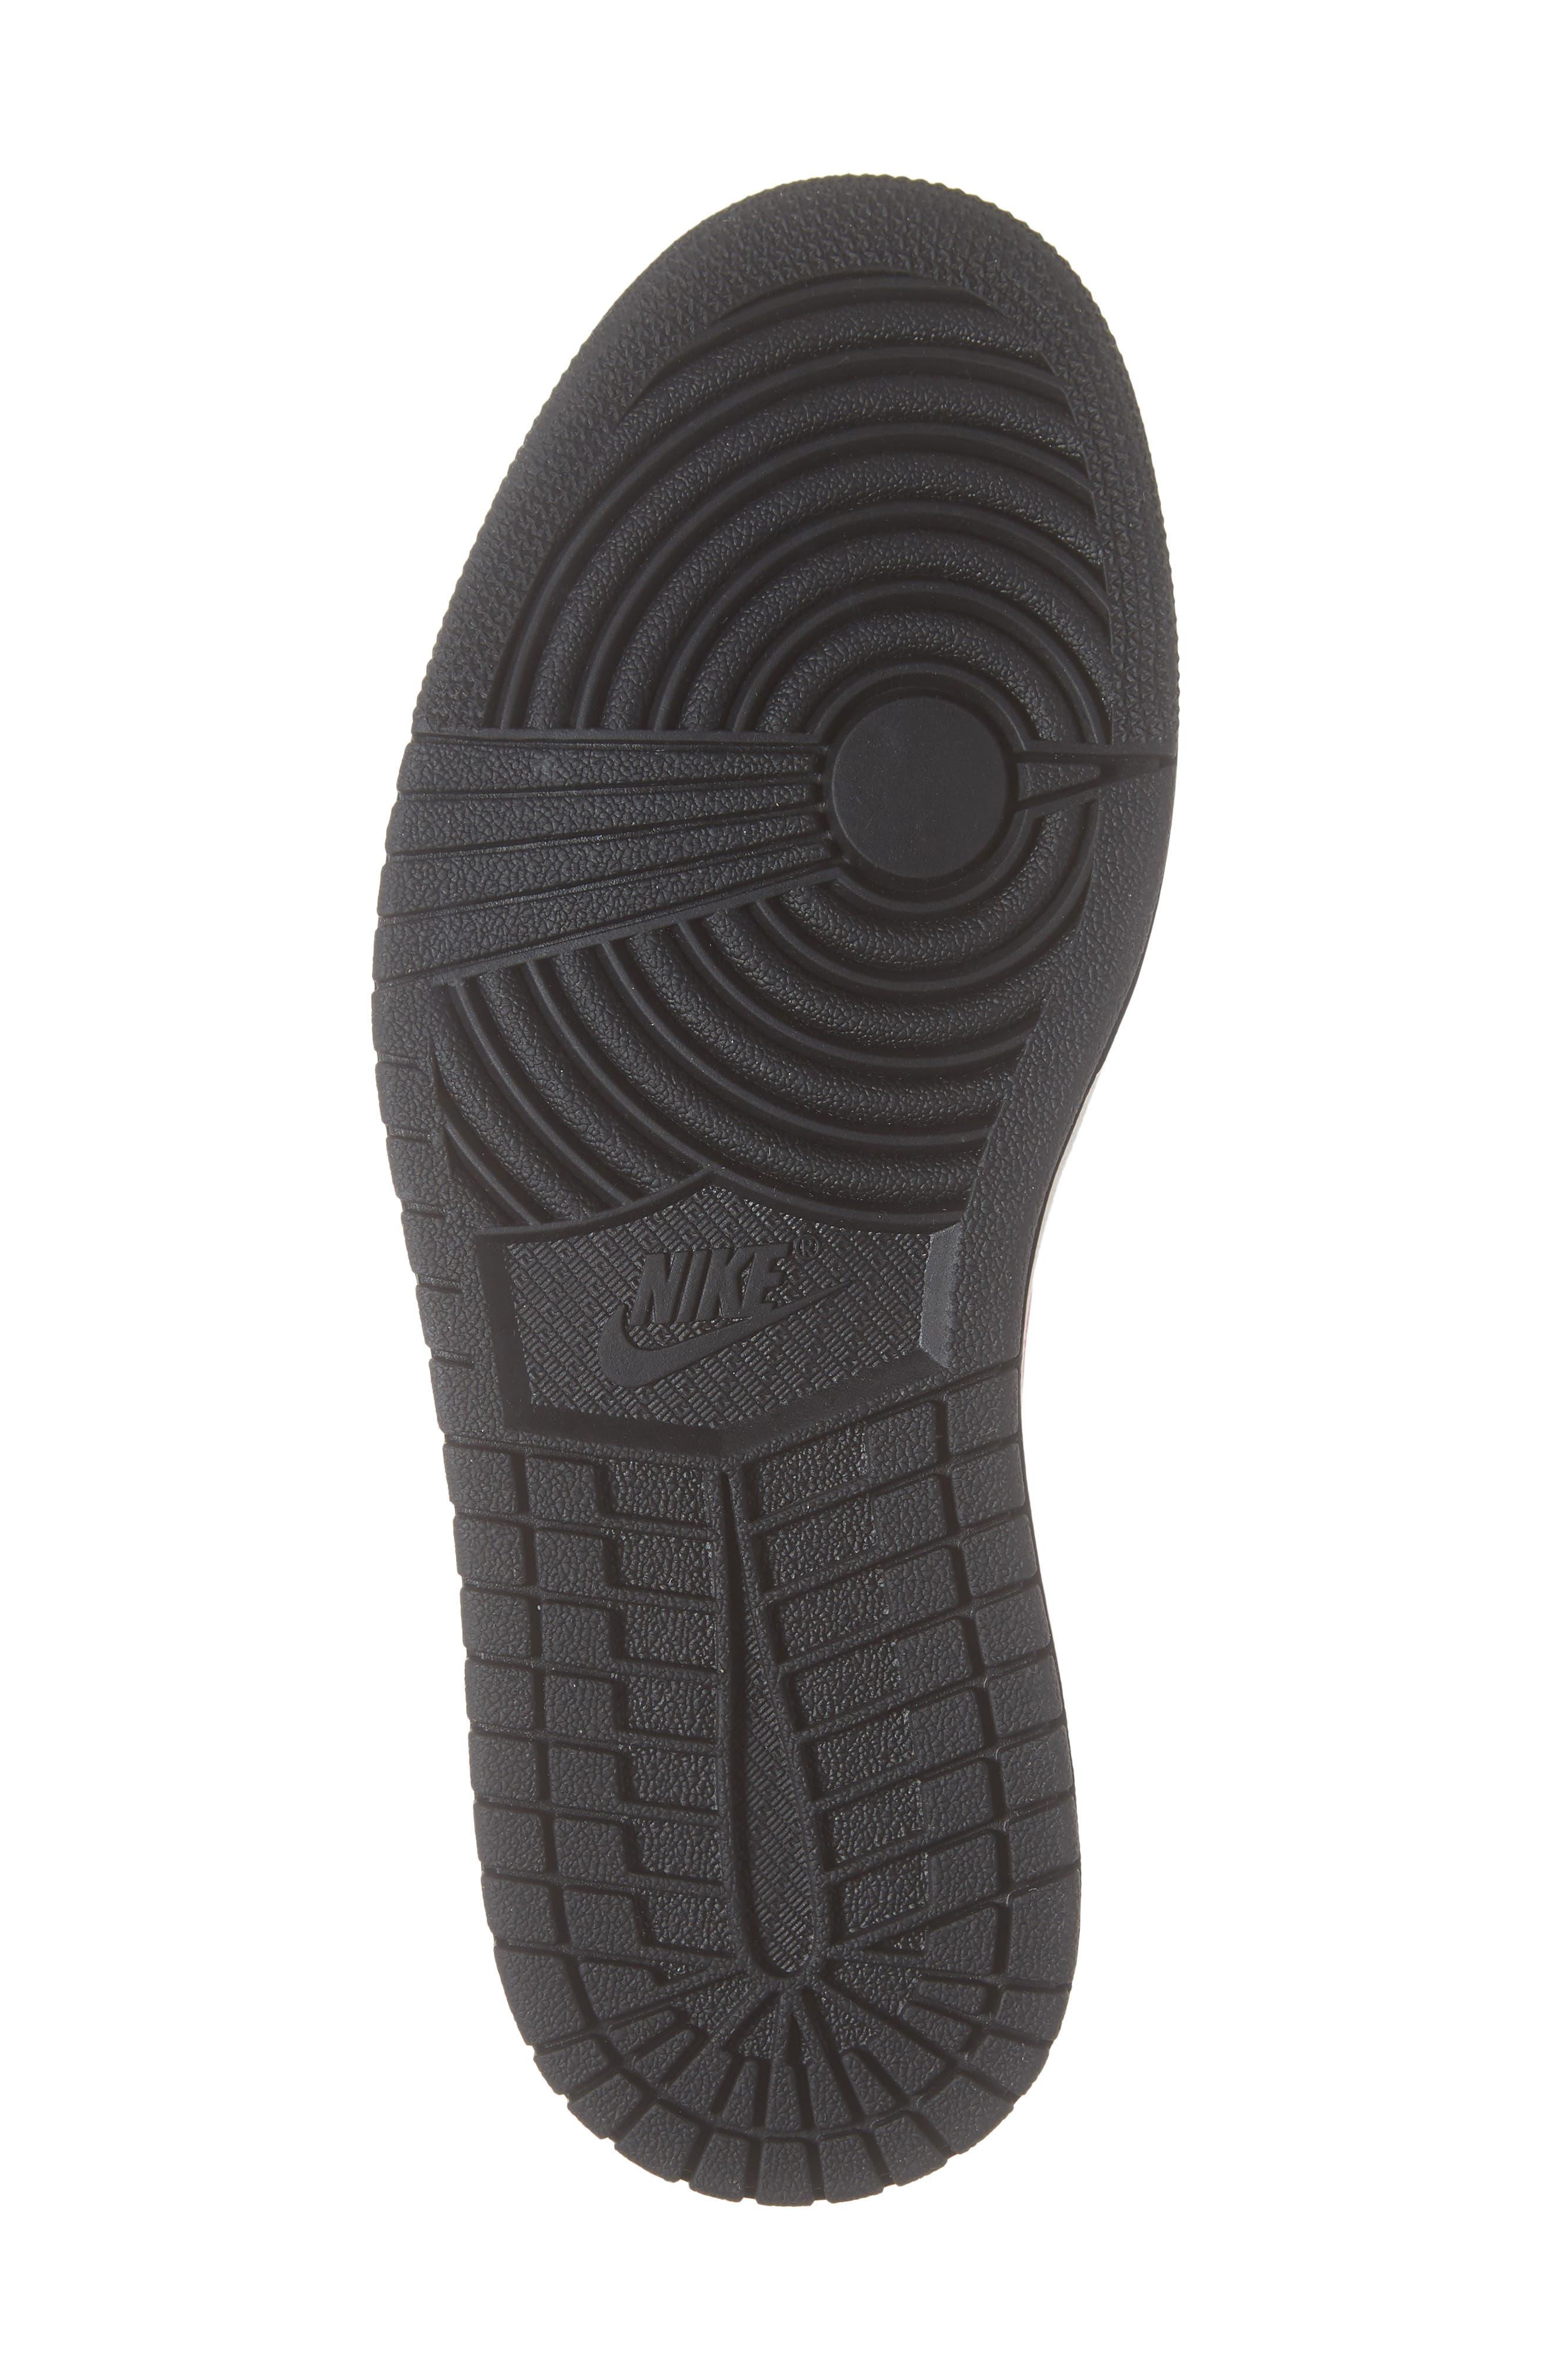 NIKE,                             Air Jordan 1 Retro Low OG Sneaker,                             Alternate thumbnail 6, color,                             200